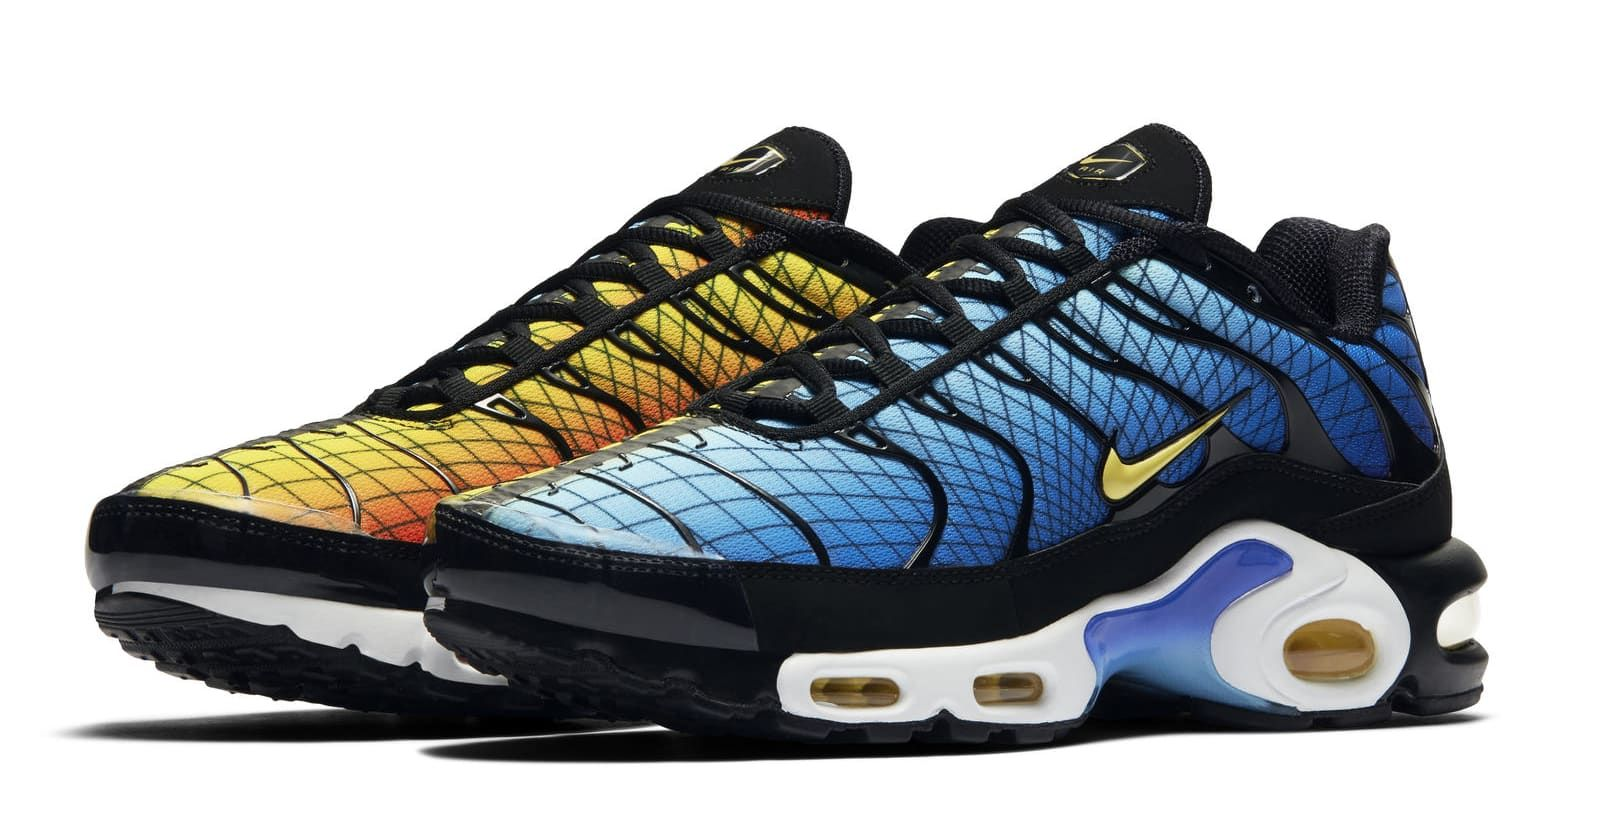 Nike Air Max Plus 'Greedy' Release Date | | Snk, Tenis